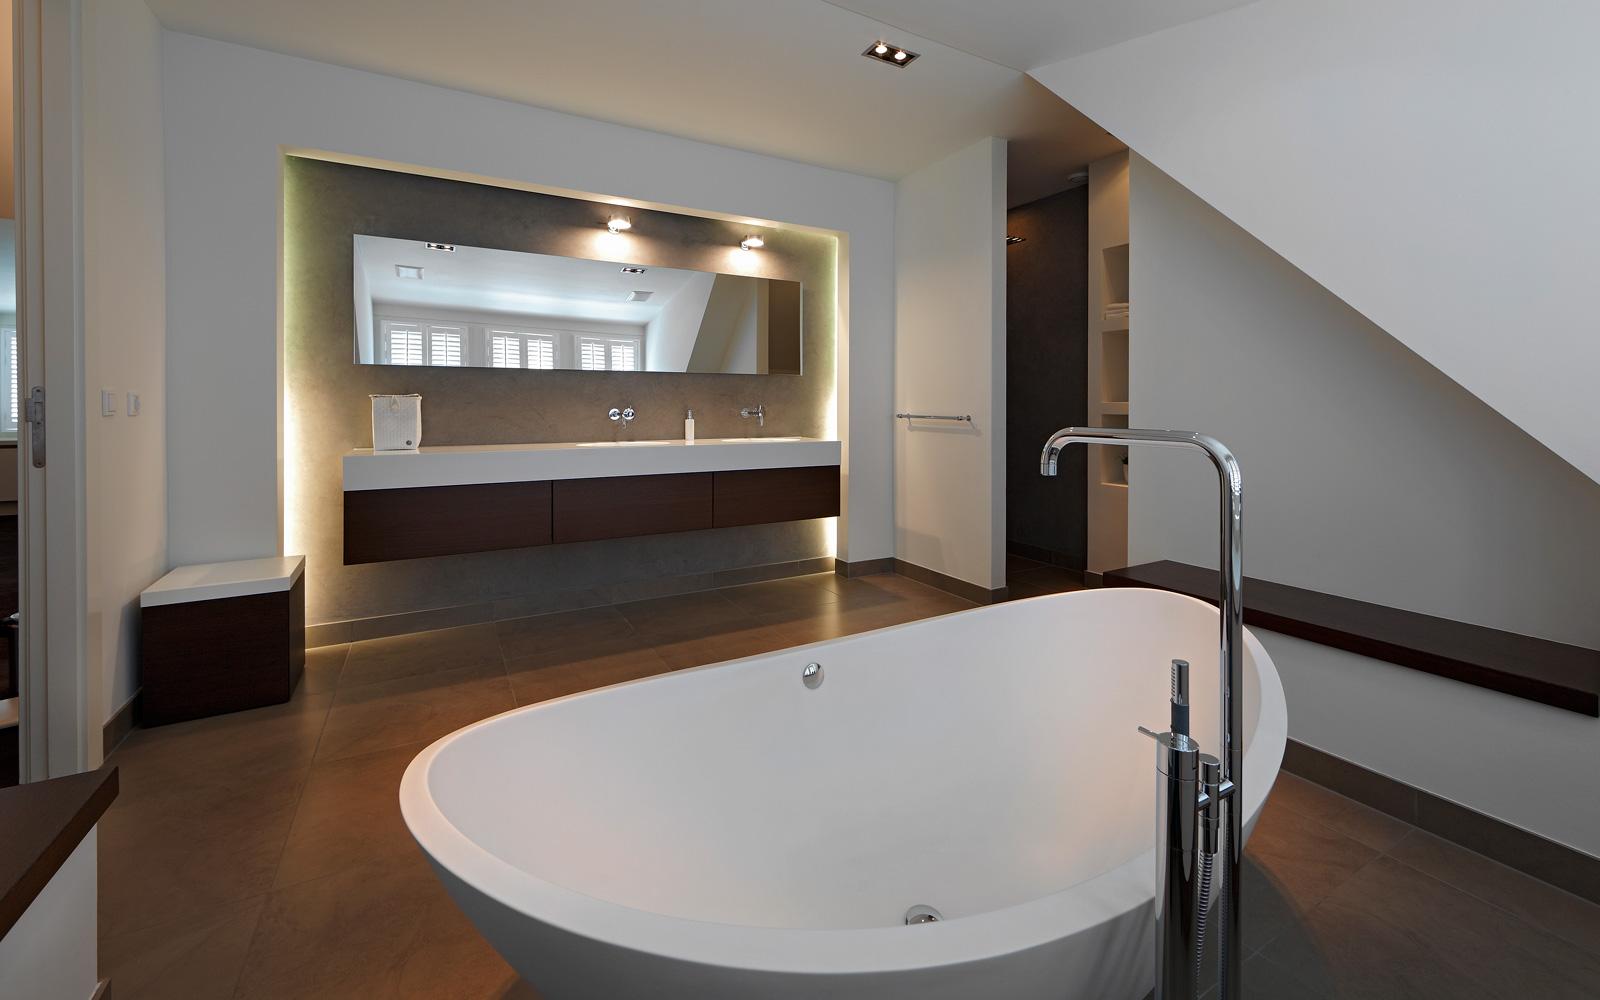 Badkamer, bad, vrijstaand bad, sanitair, wastafel, spiegel, hedendaags landhuis, Marco Daverveld